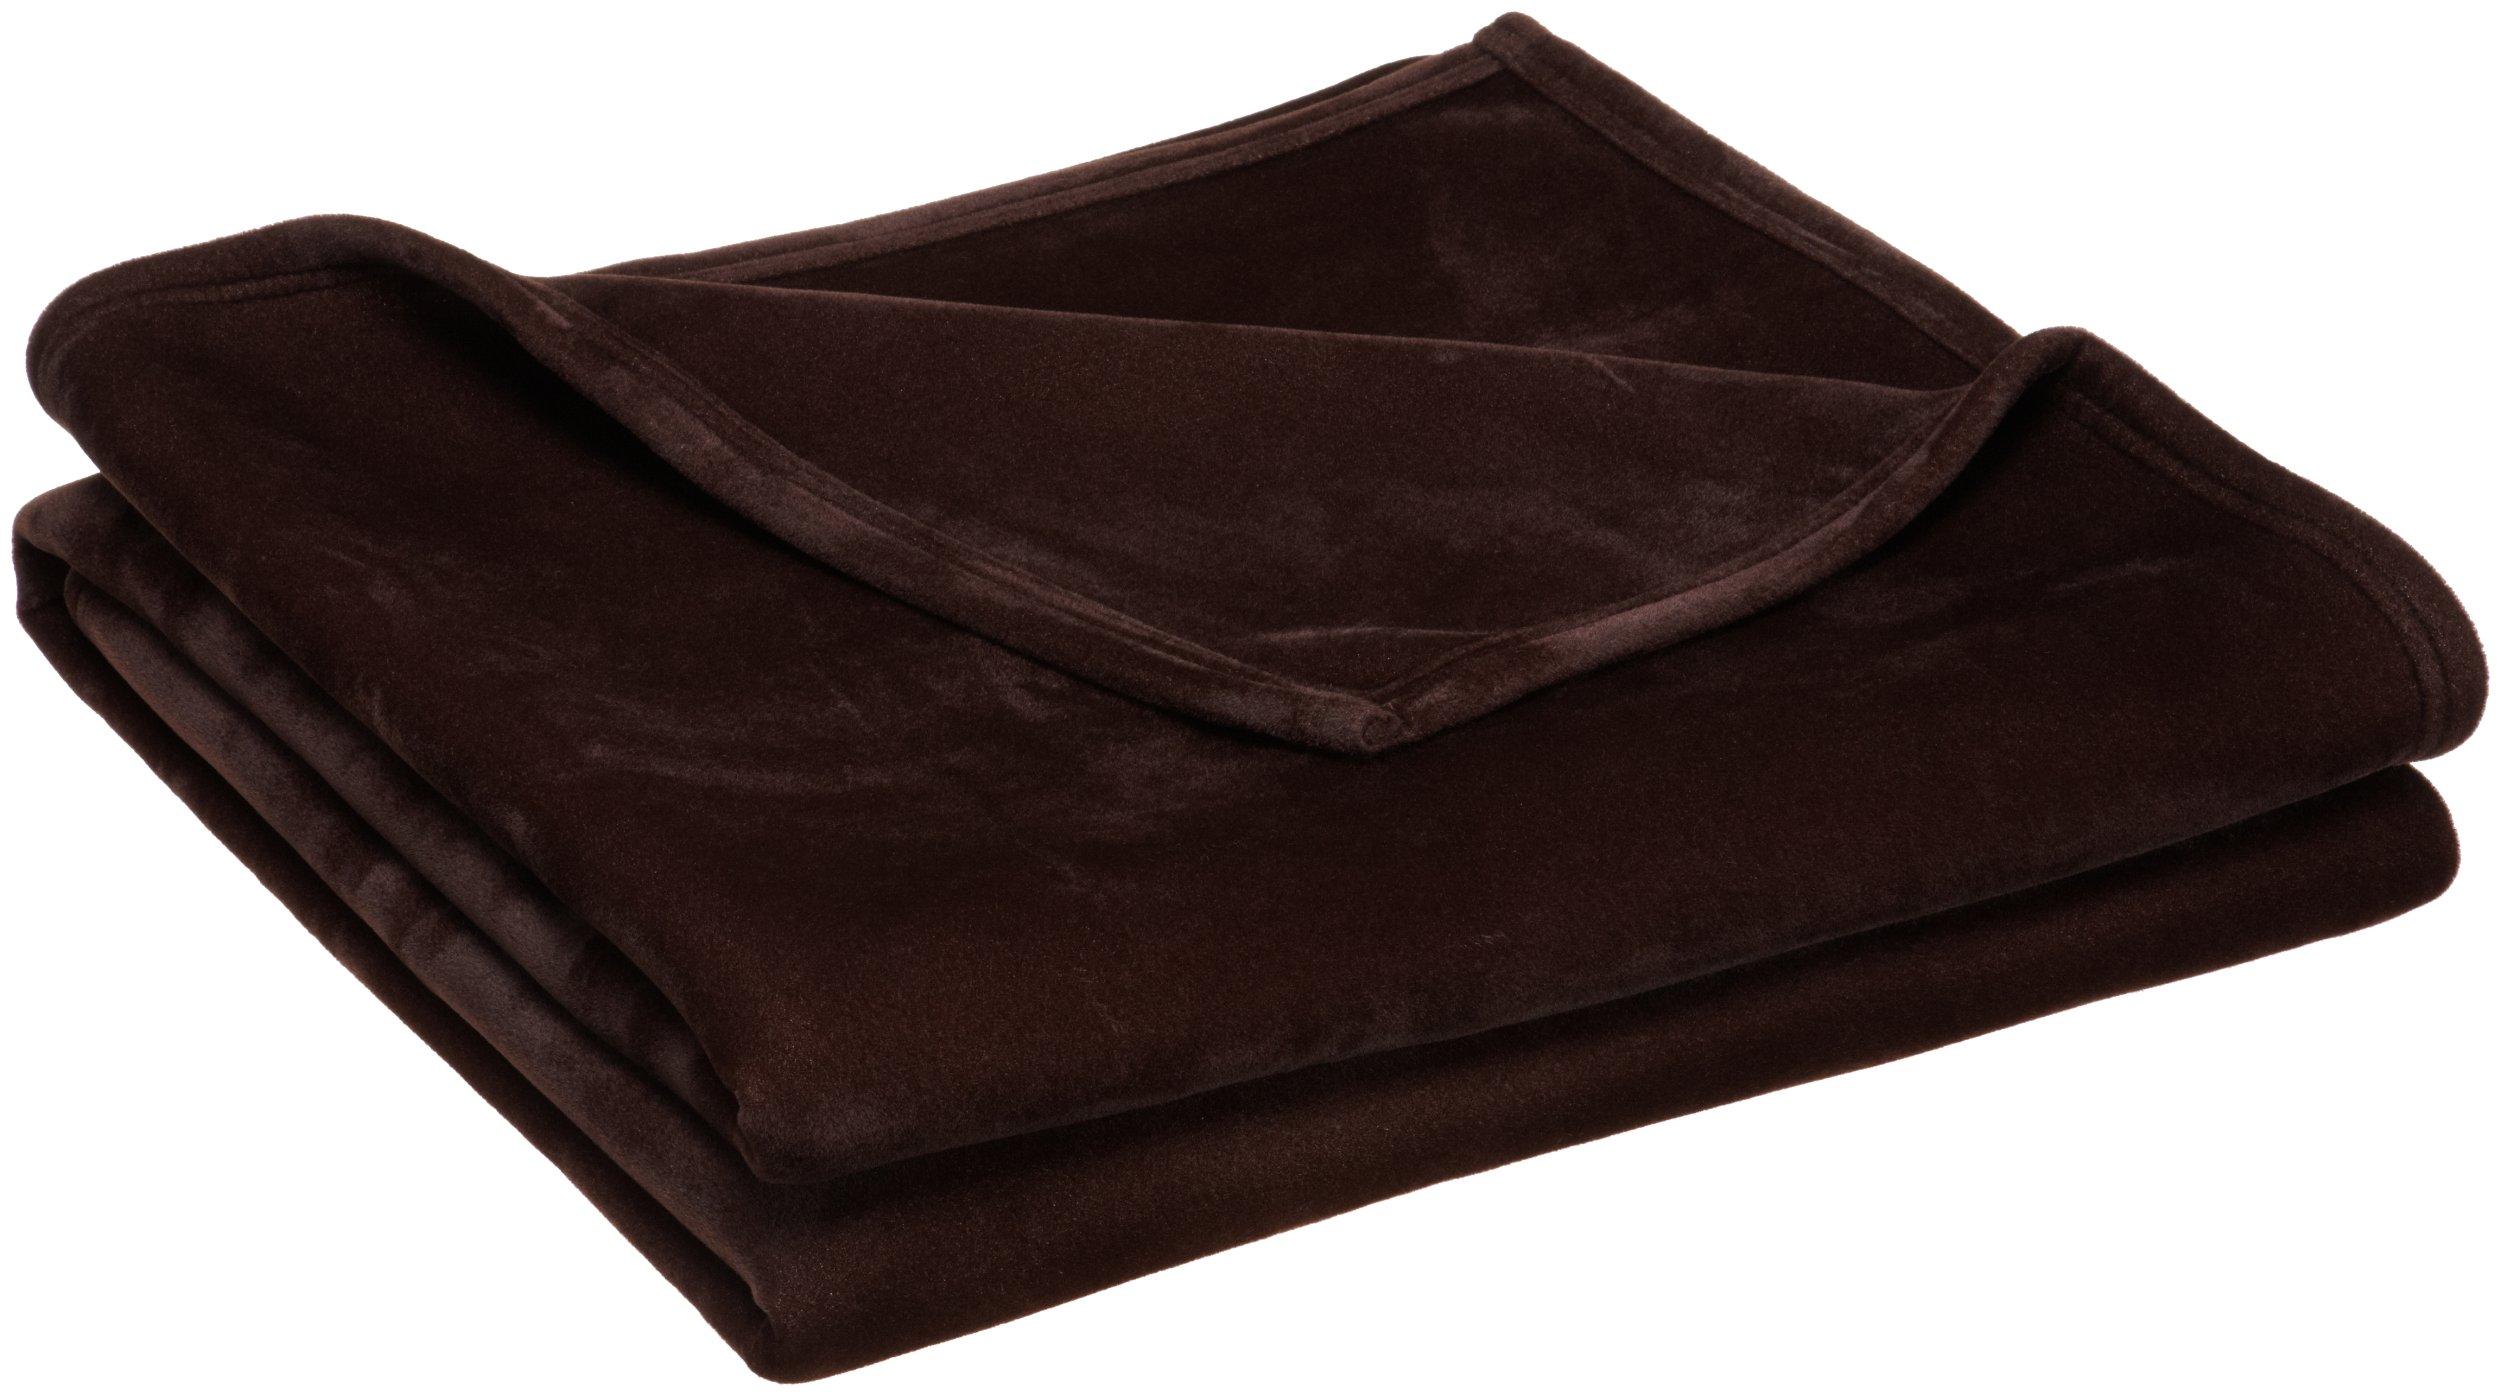 Vellux original warm soft plush blanket throw for Vellux blanket